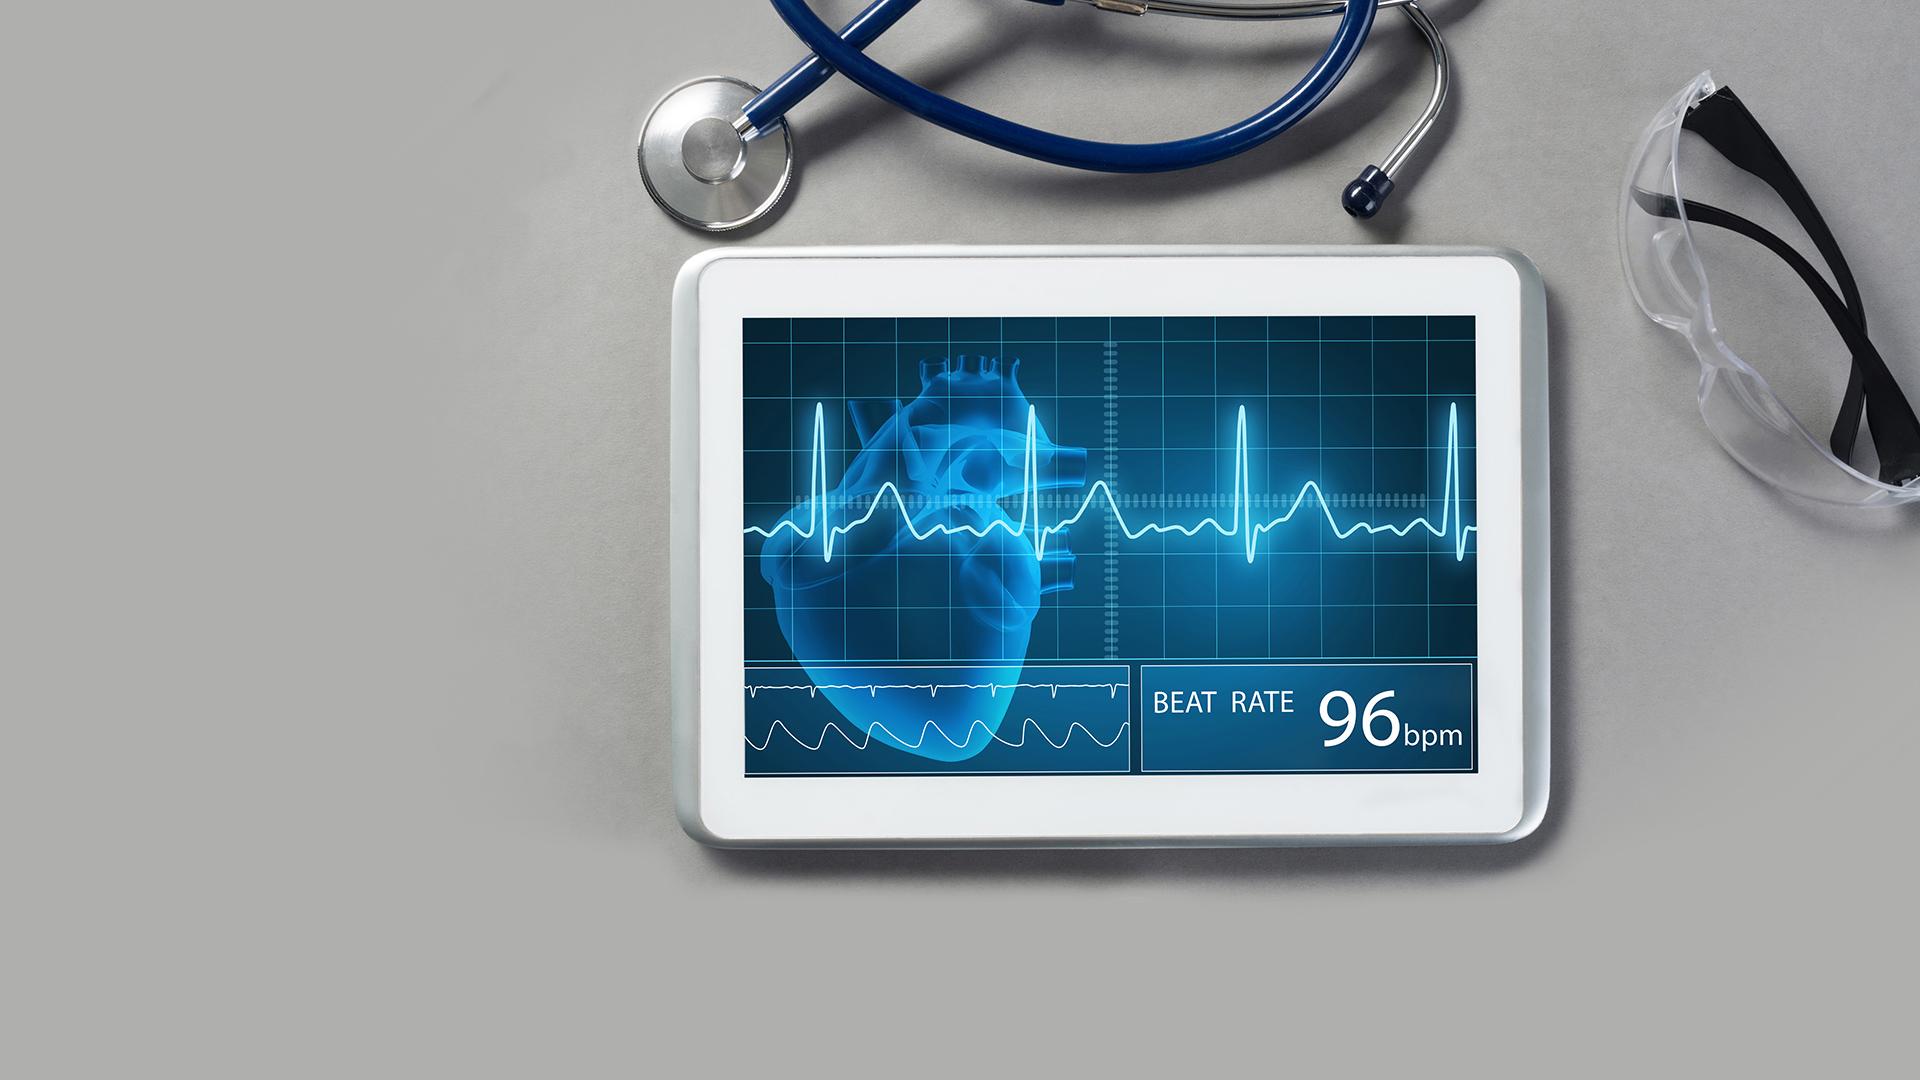 E-Health-Aktien: Die digitale Welle